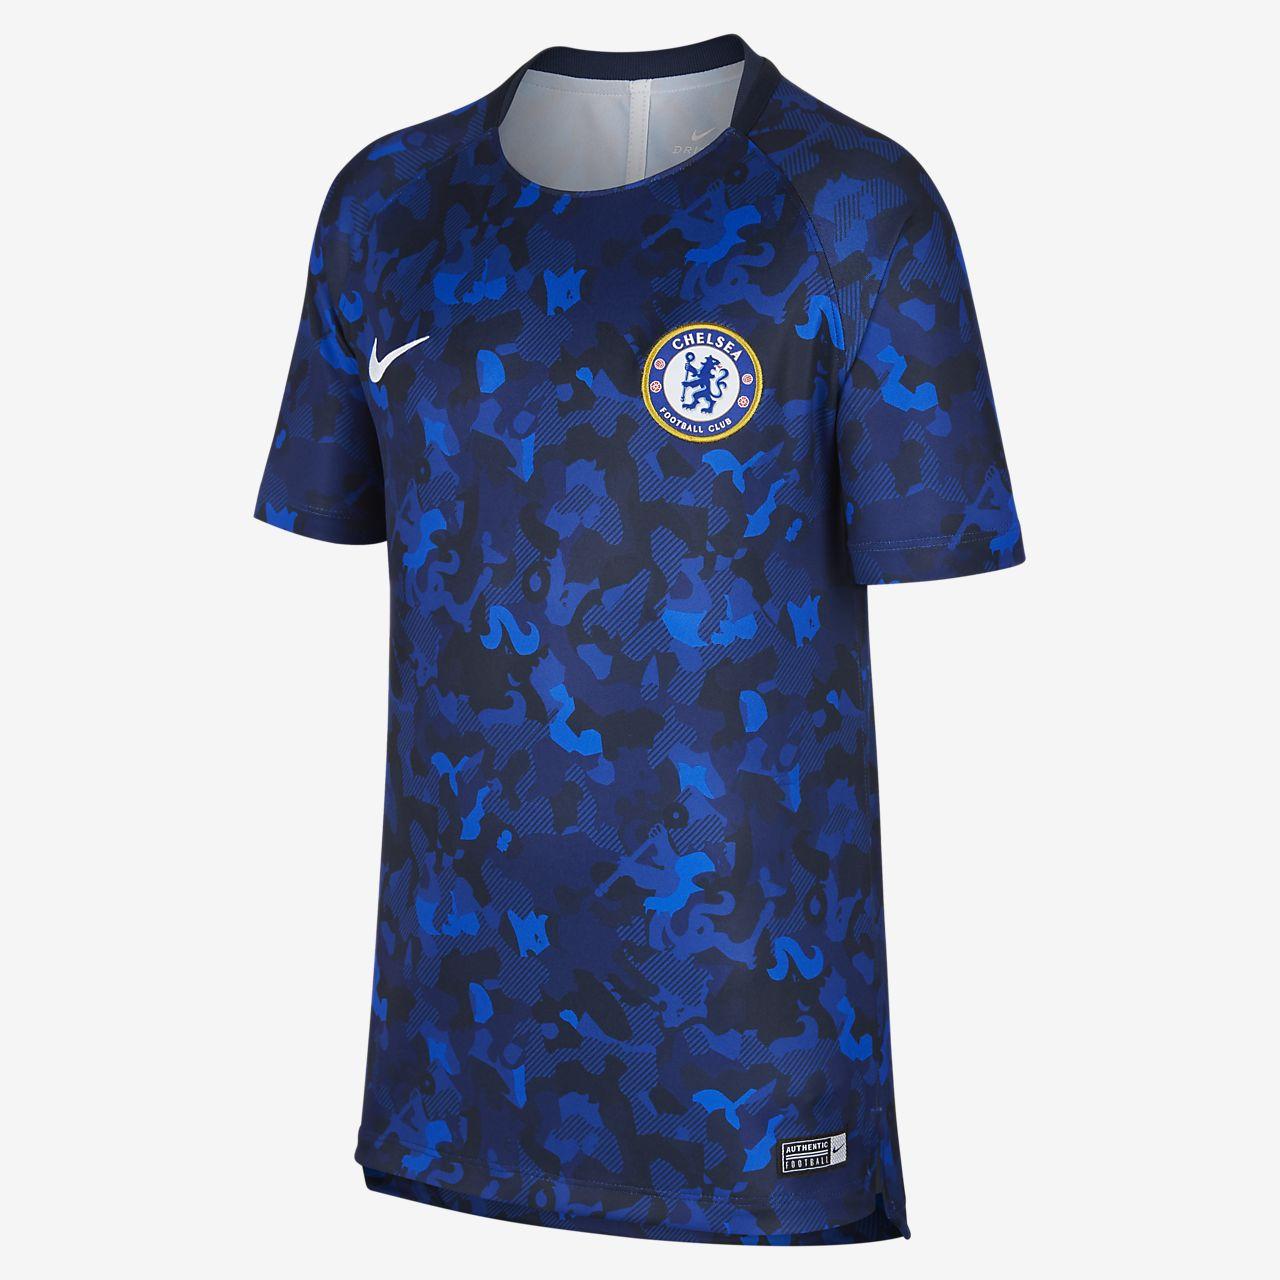 Top de fútbol para niños talla grande Chelsea FC Dri-FIT Squad